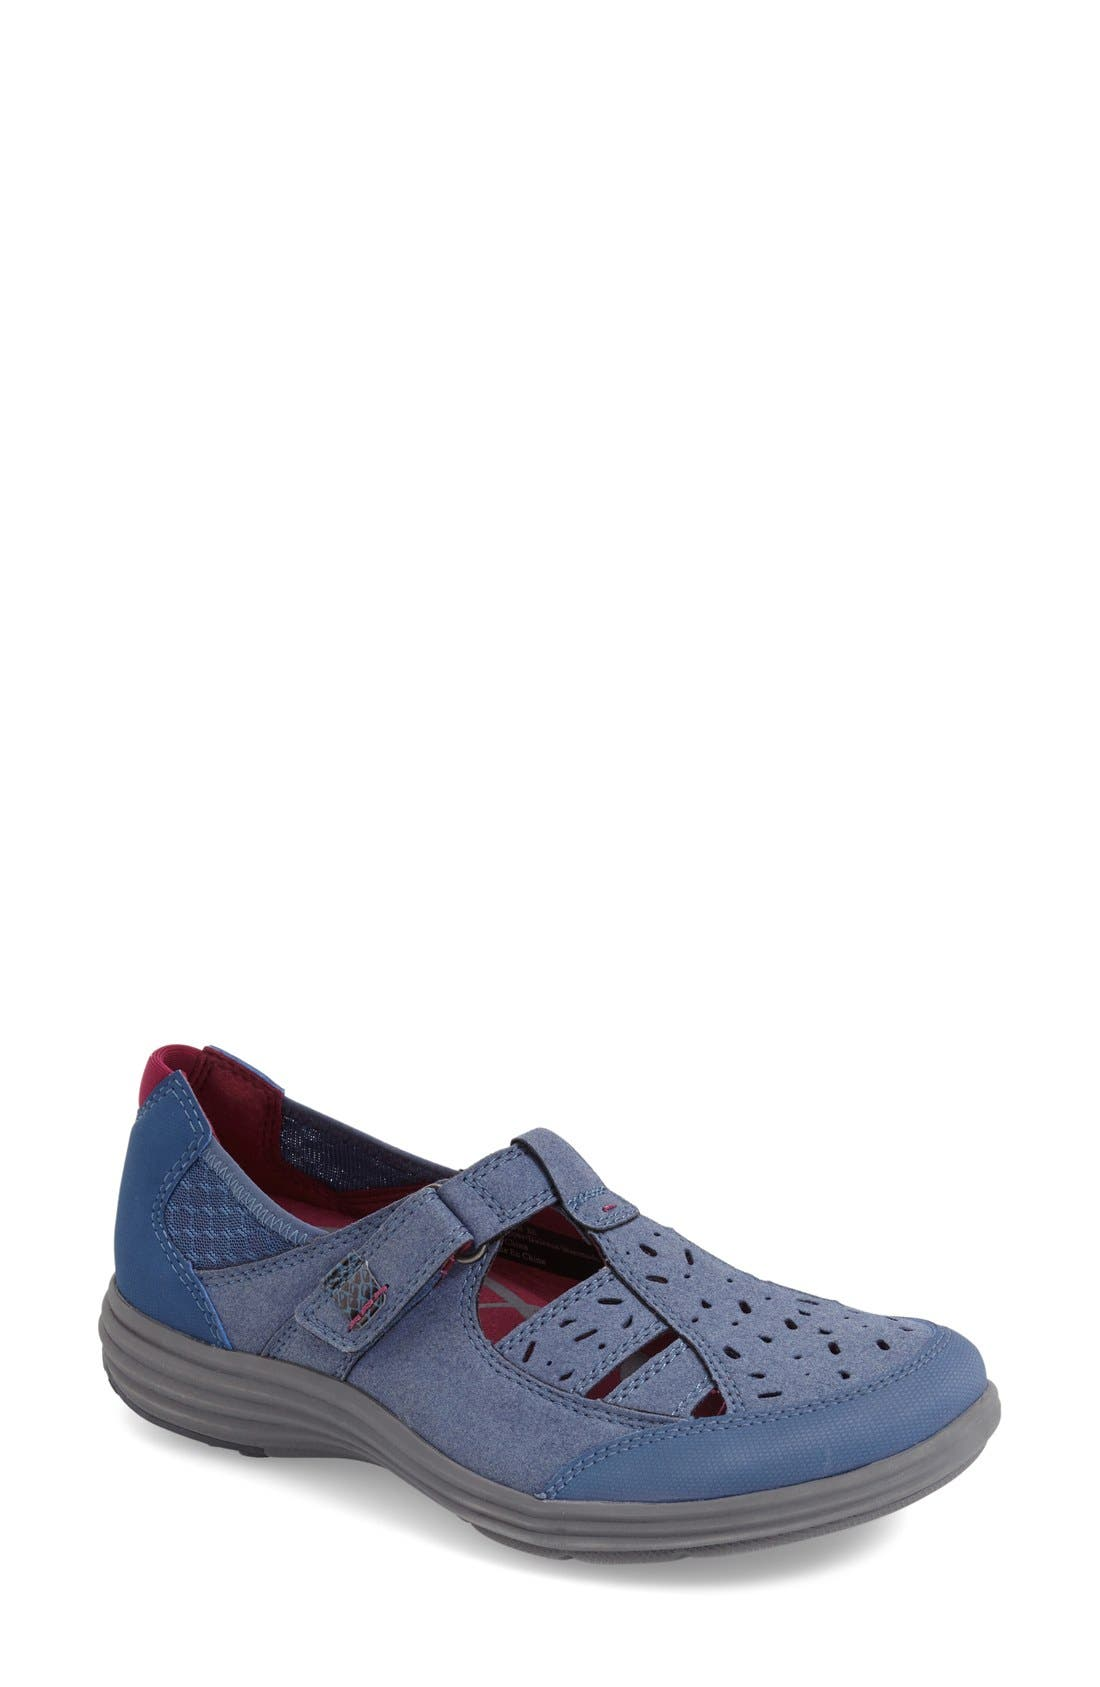 Alternate Image 1 Selected - Aravon 'Barbara' Sneaker (Women)